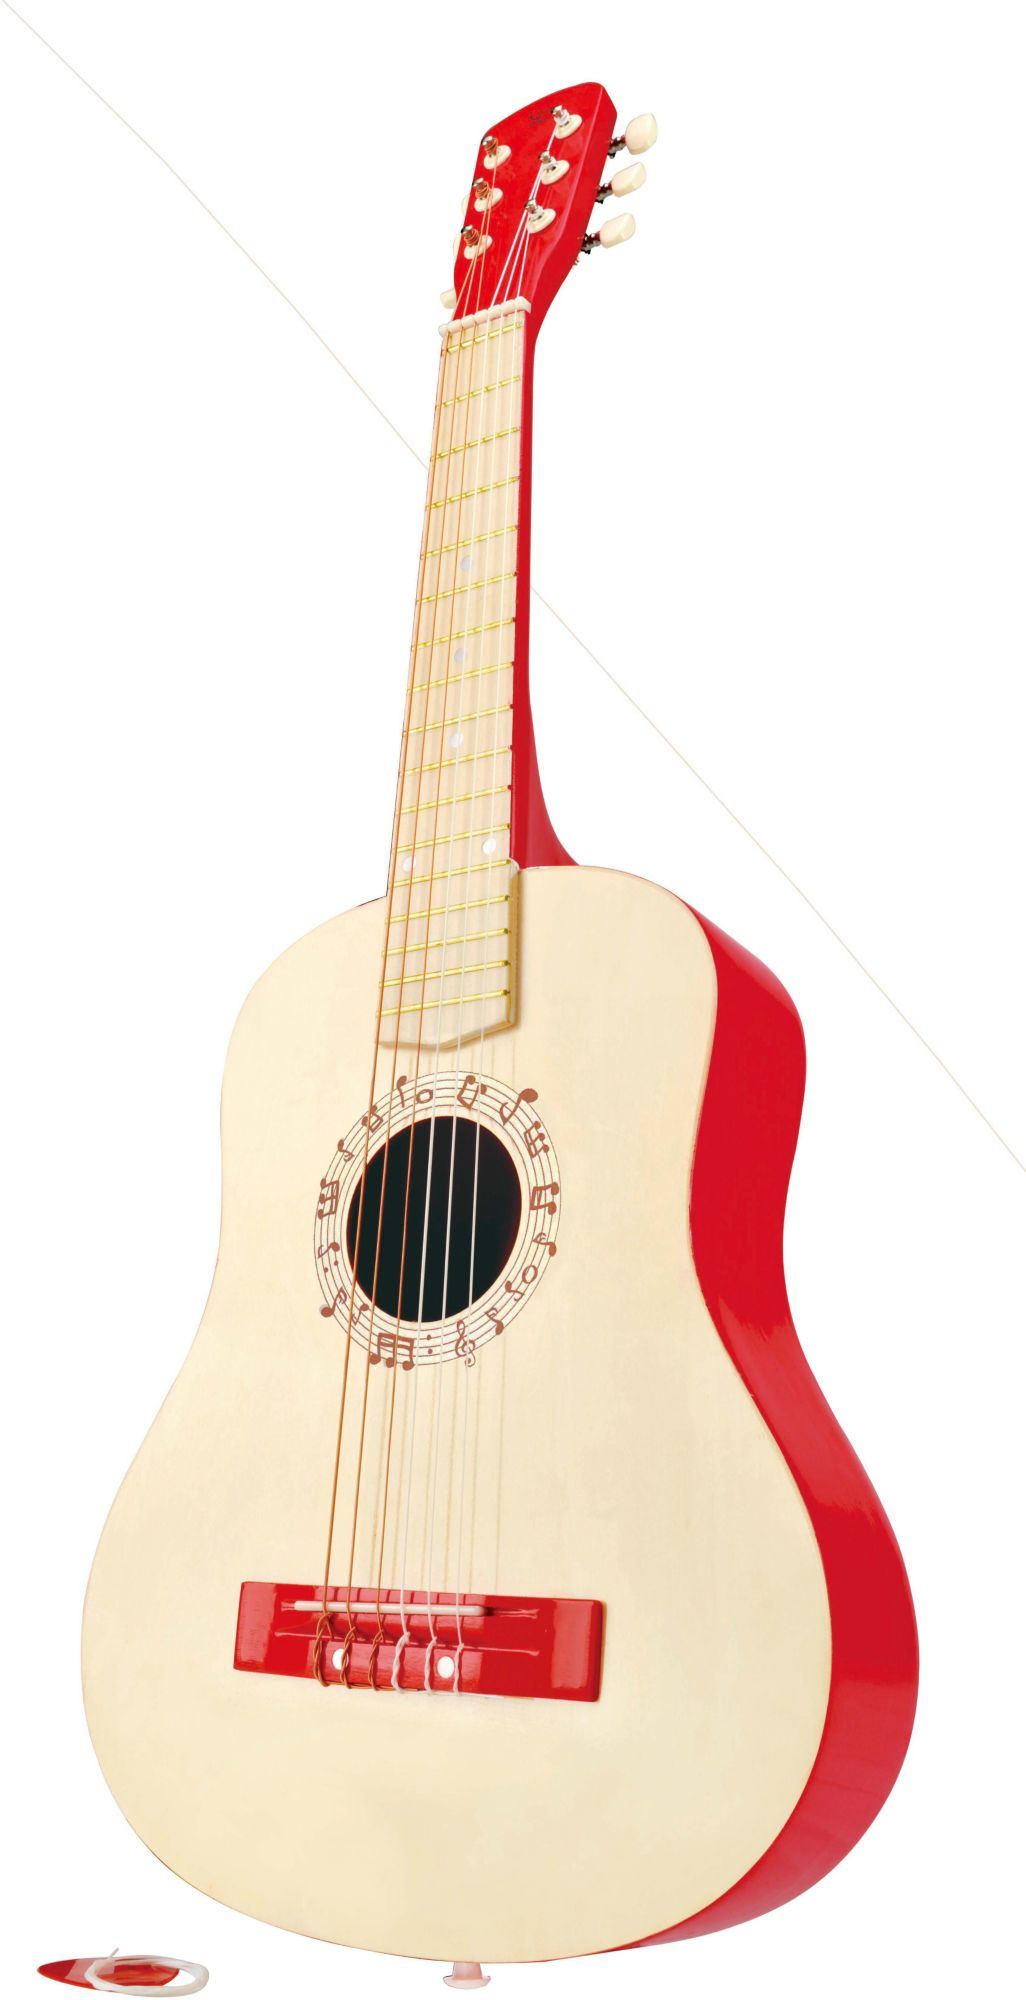 HAPE Hape Kindergitarre, »Gitarre in Rot«